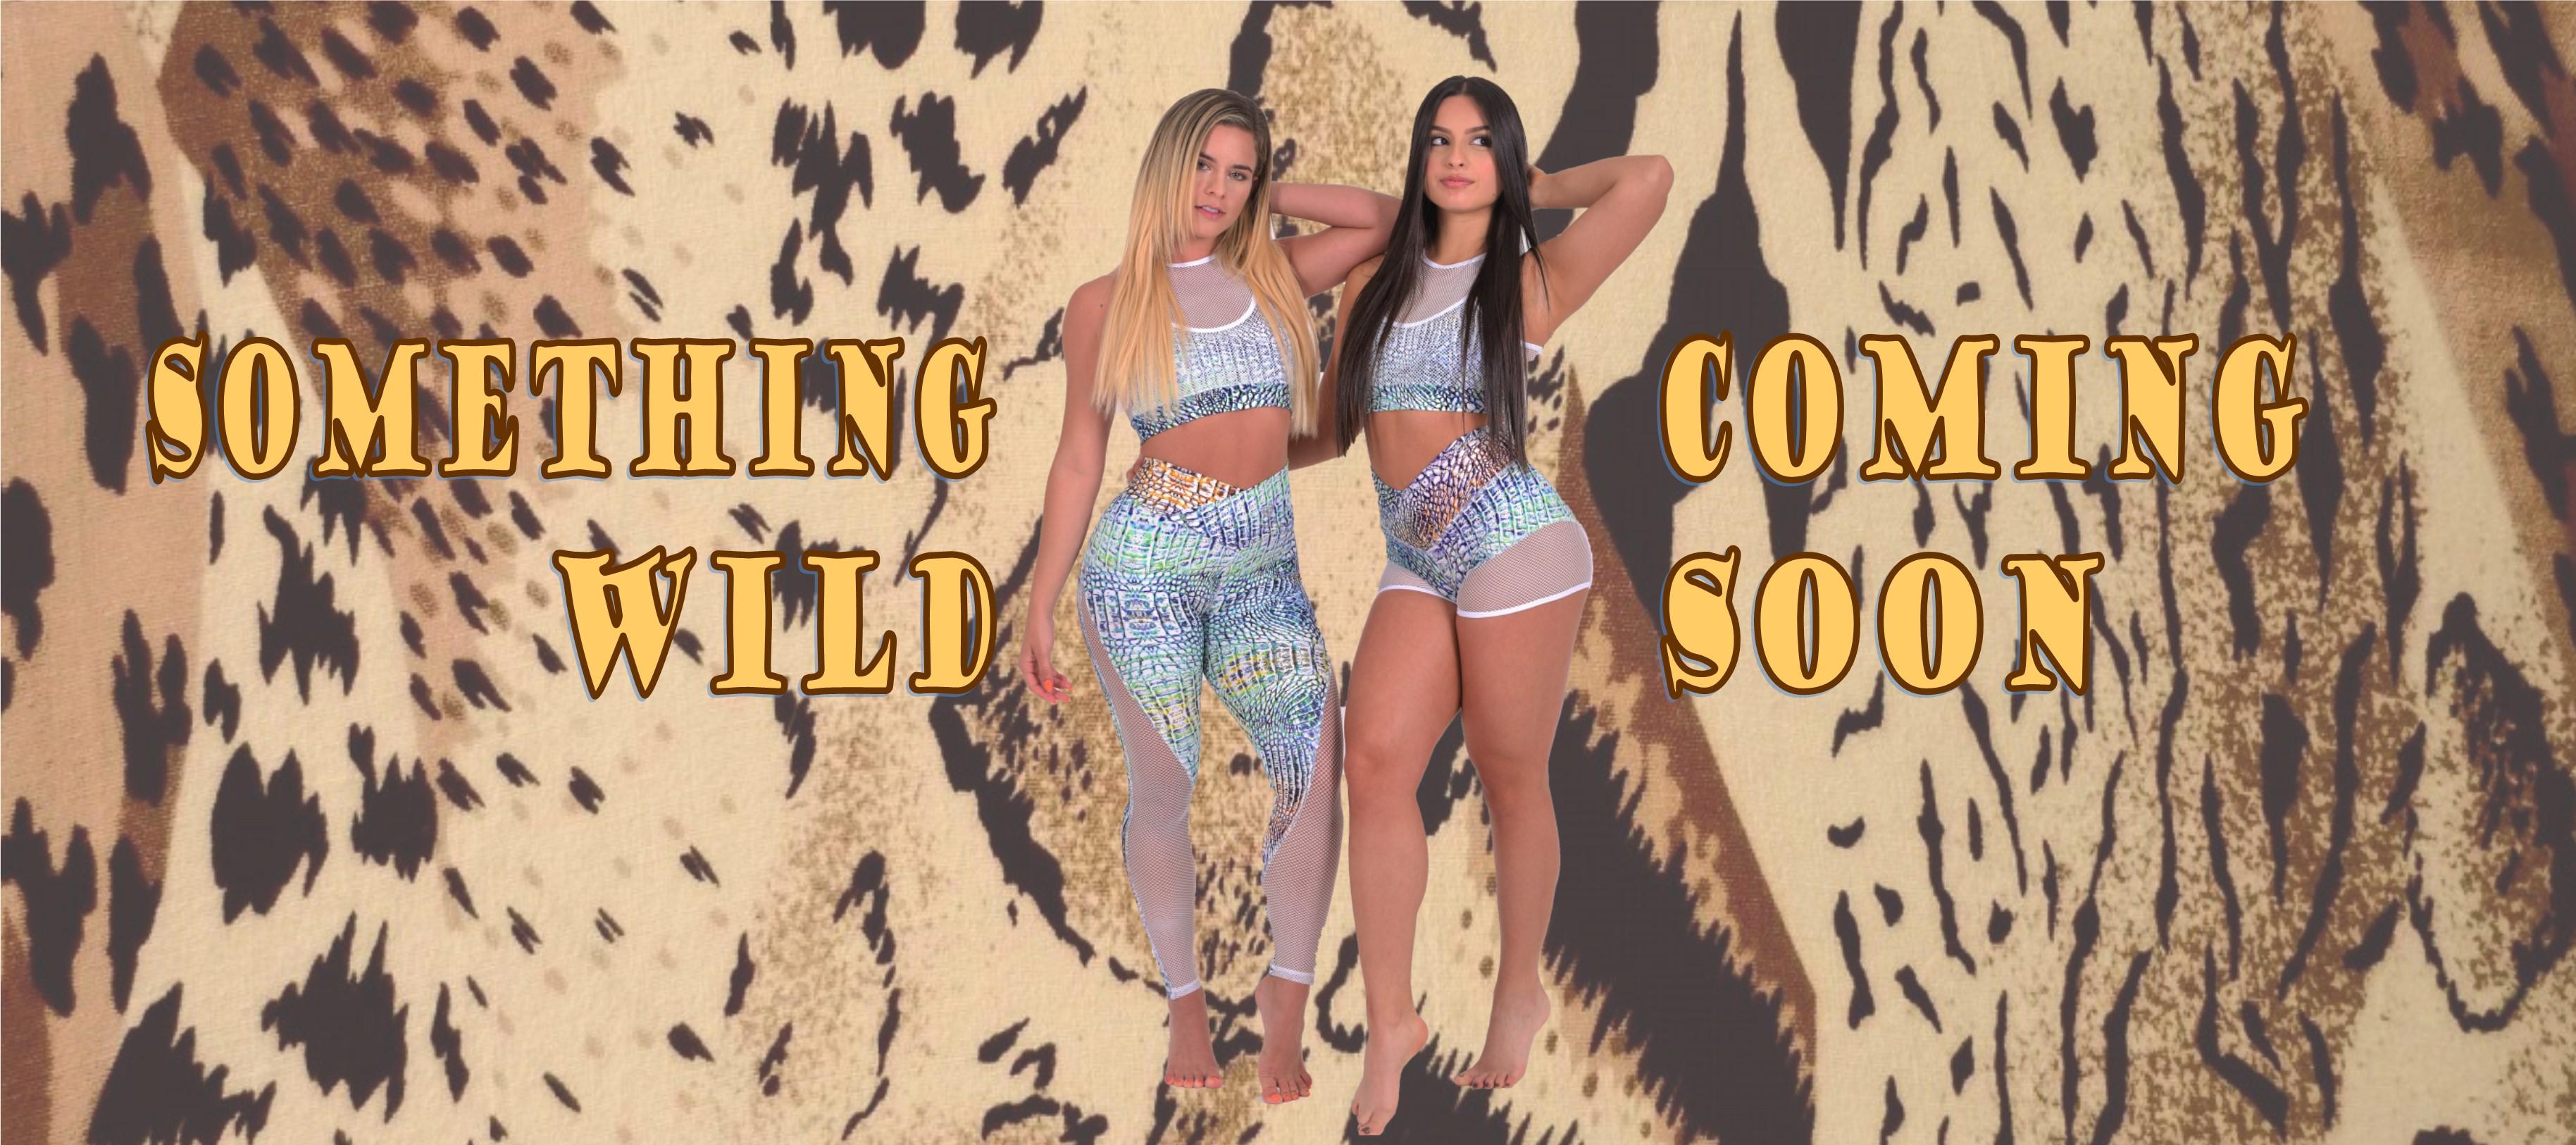 https://www.clssportswear.com/wp-content/uploads/2019/05/Announce-Slider_Wild_Collection.jpg